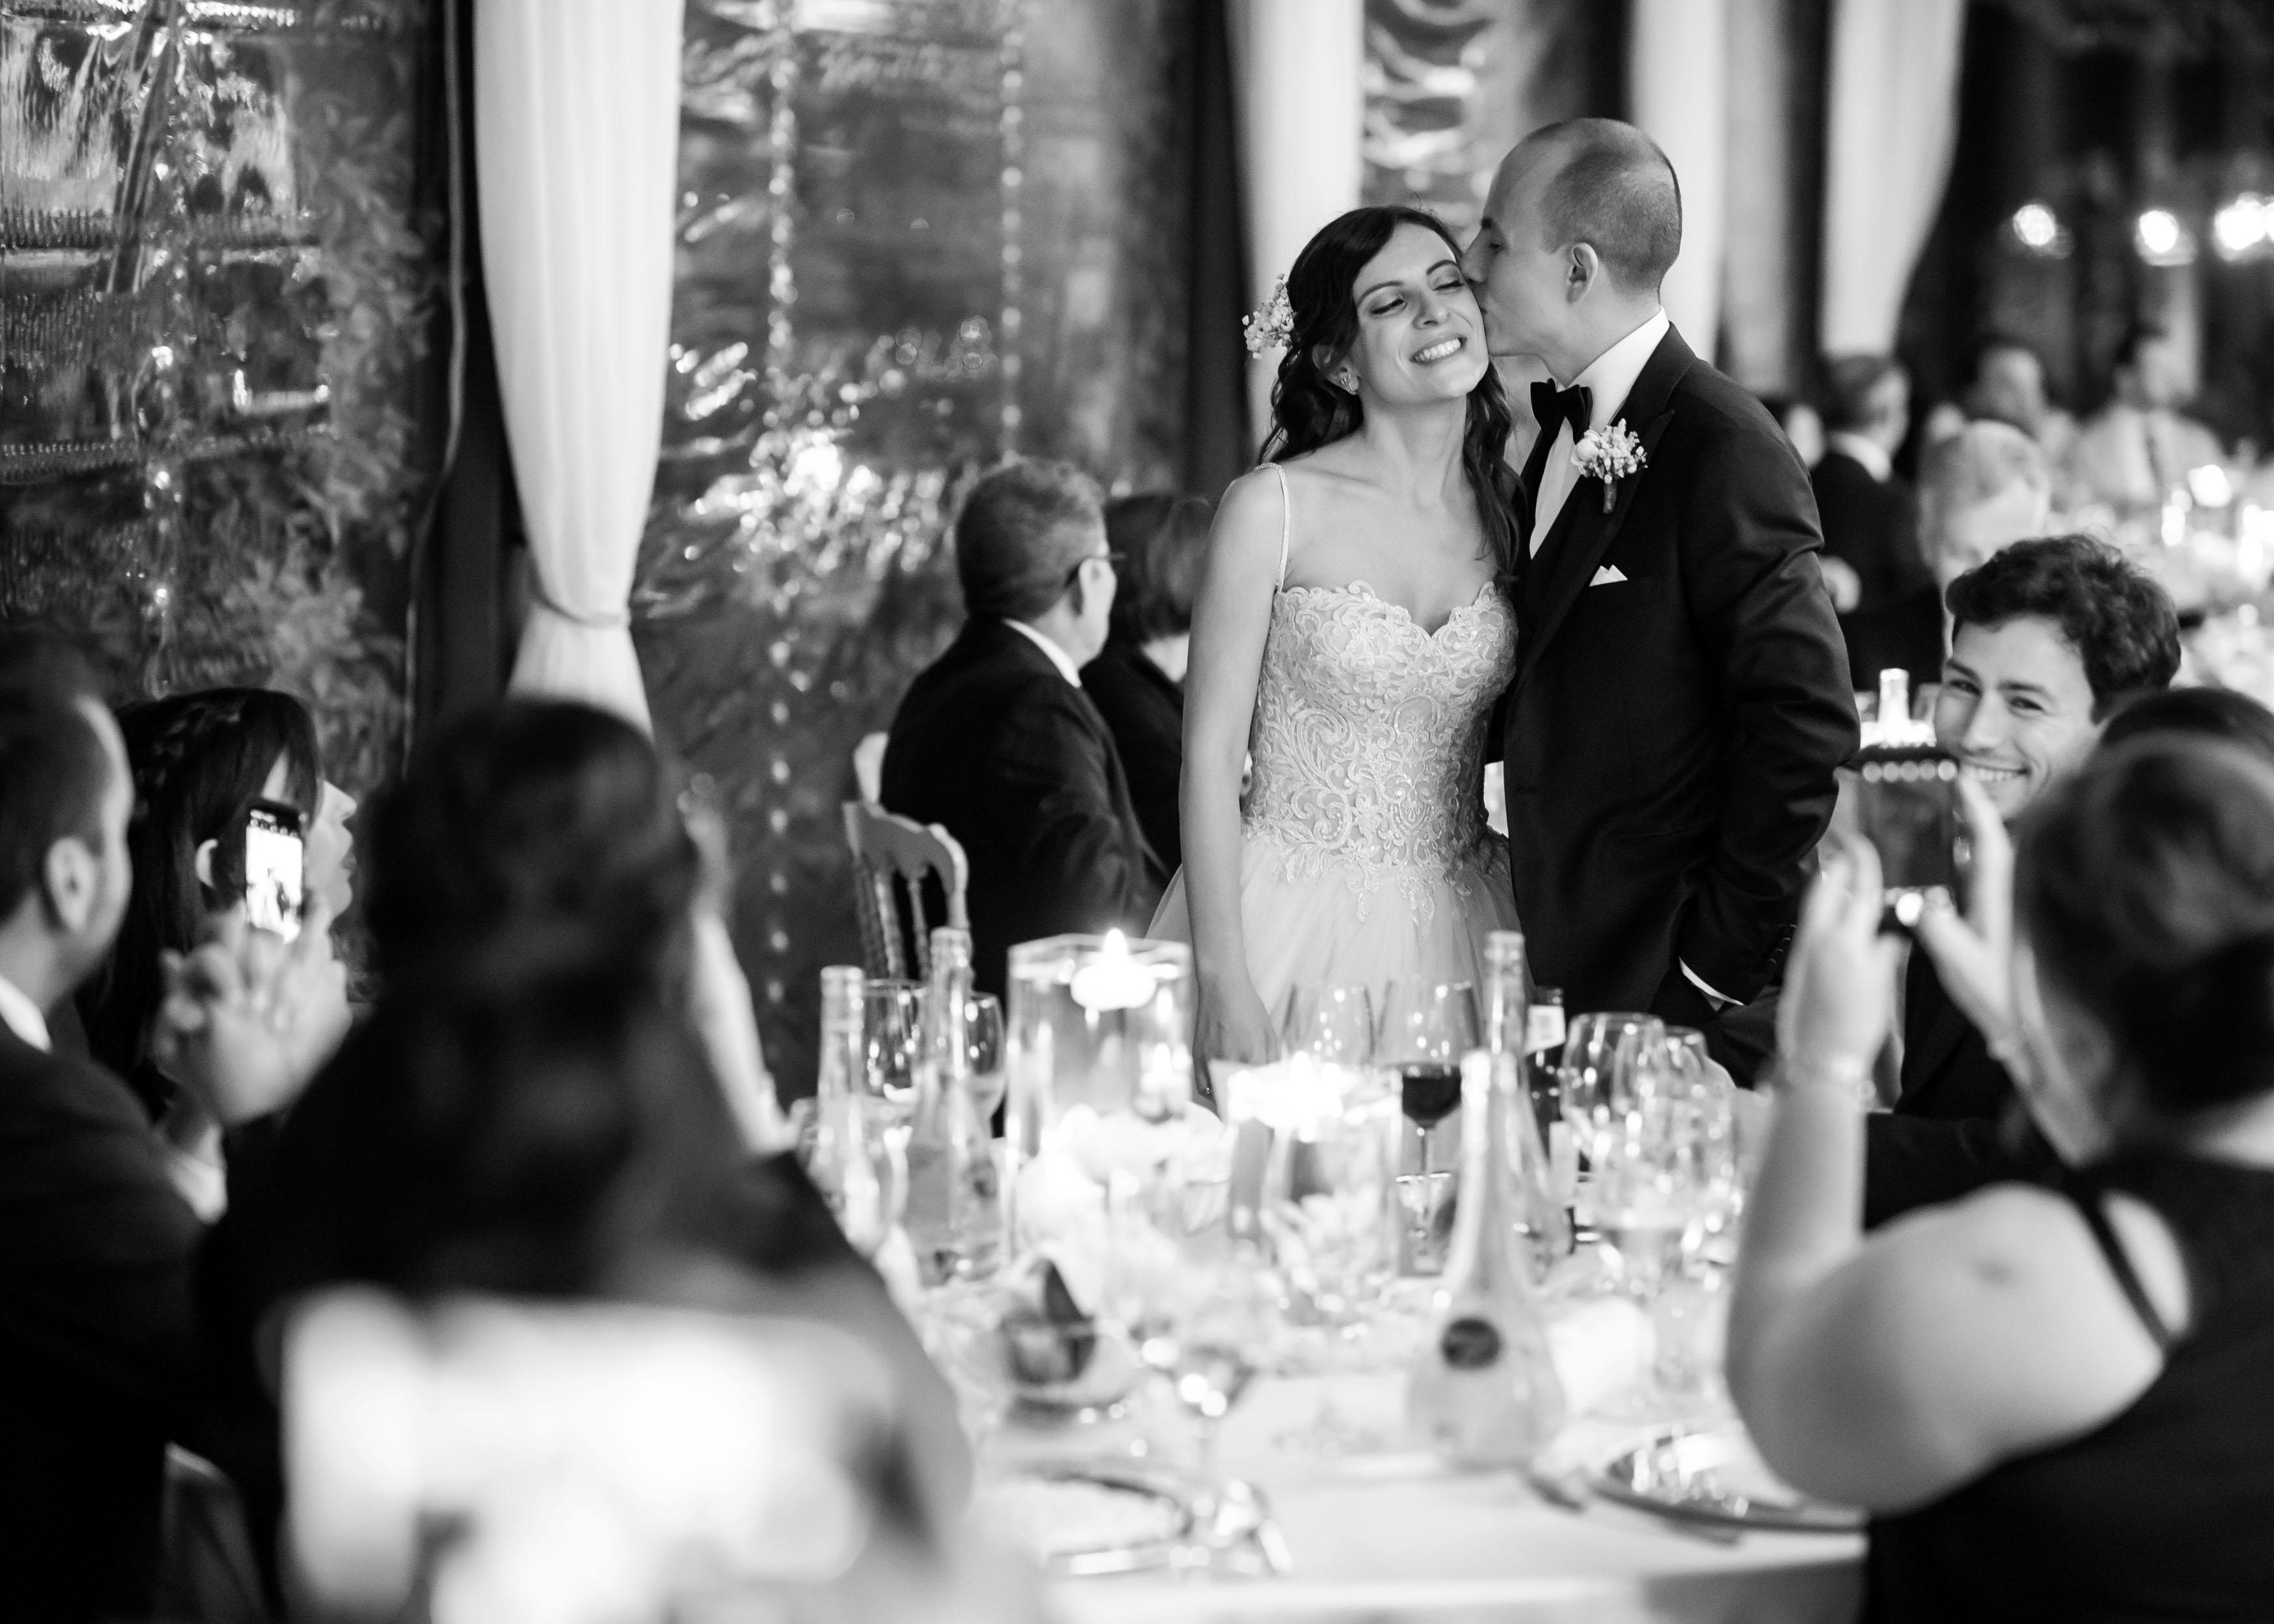 https://www.weddingamalfi.com/wp-content/uploads/Katia-Jorge-18-maggio-2019-43.jpg